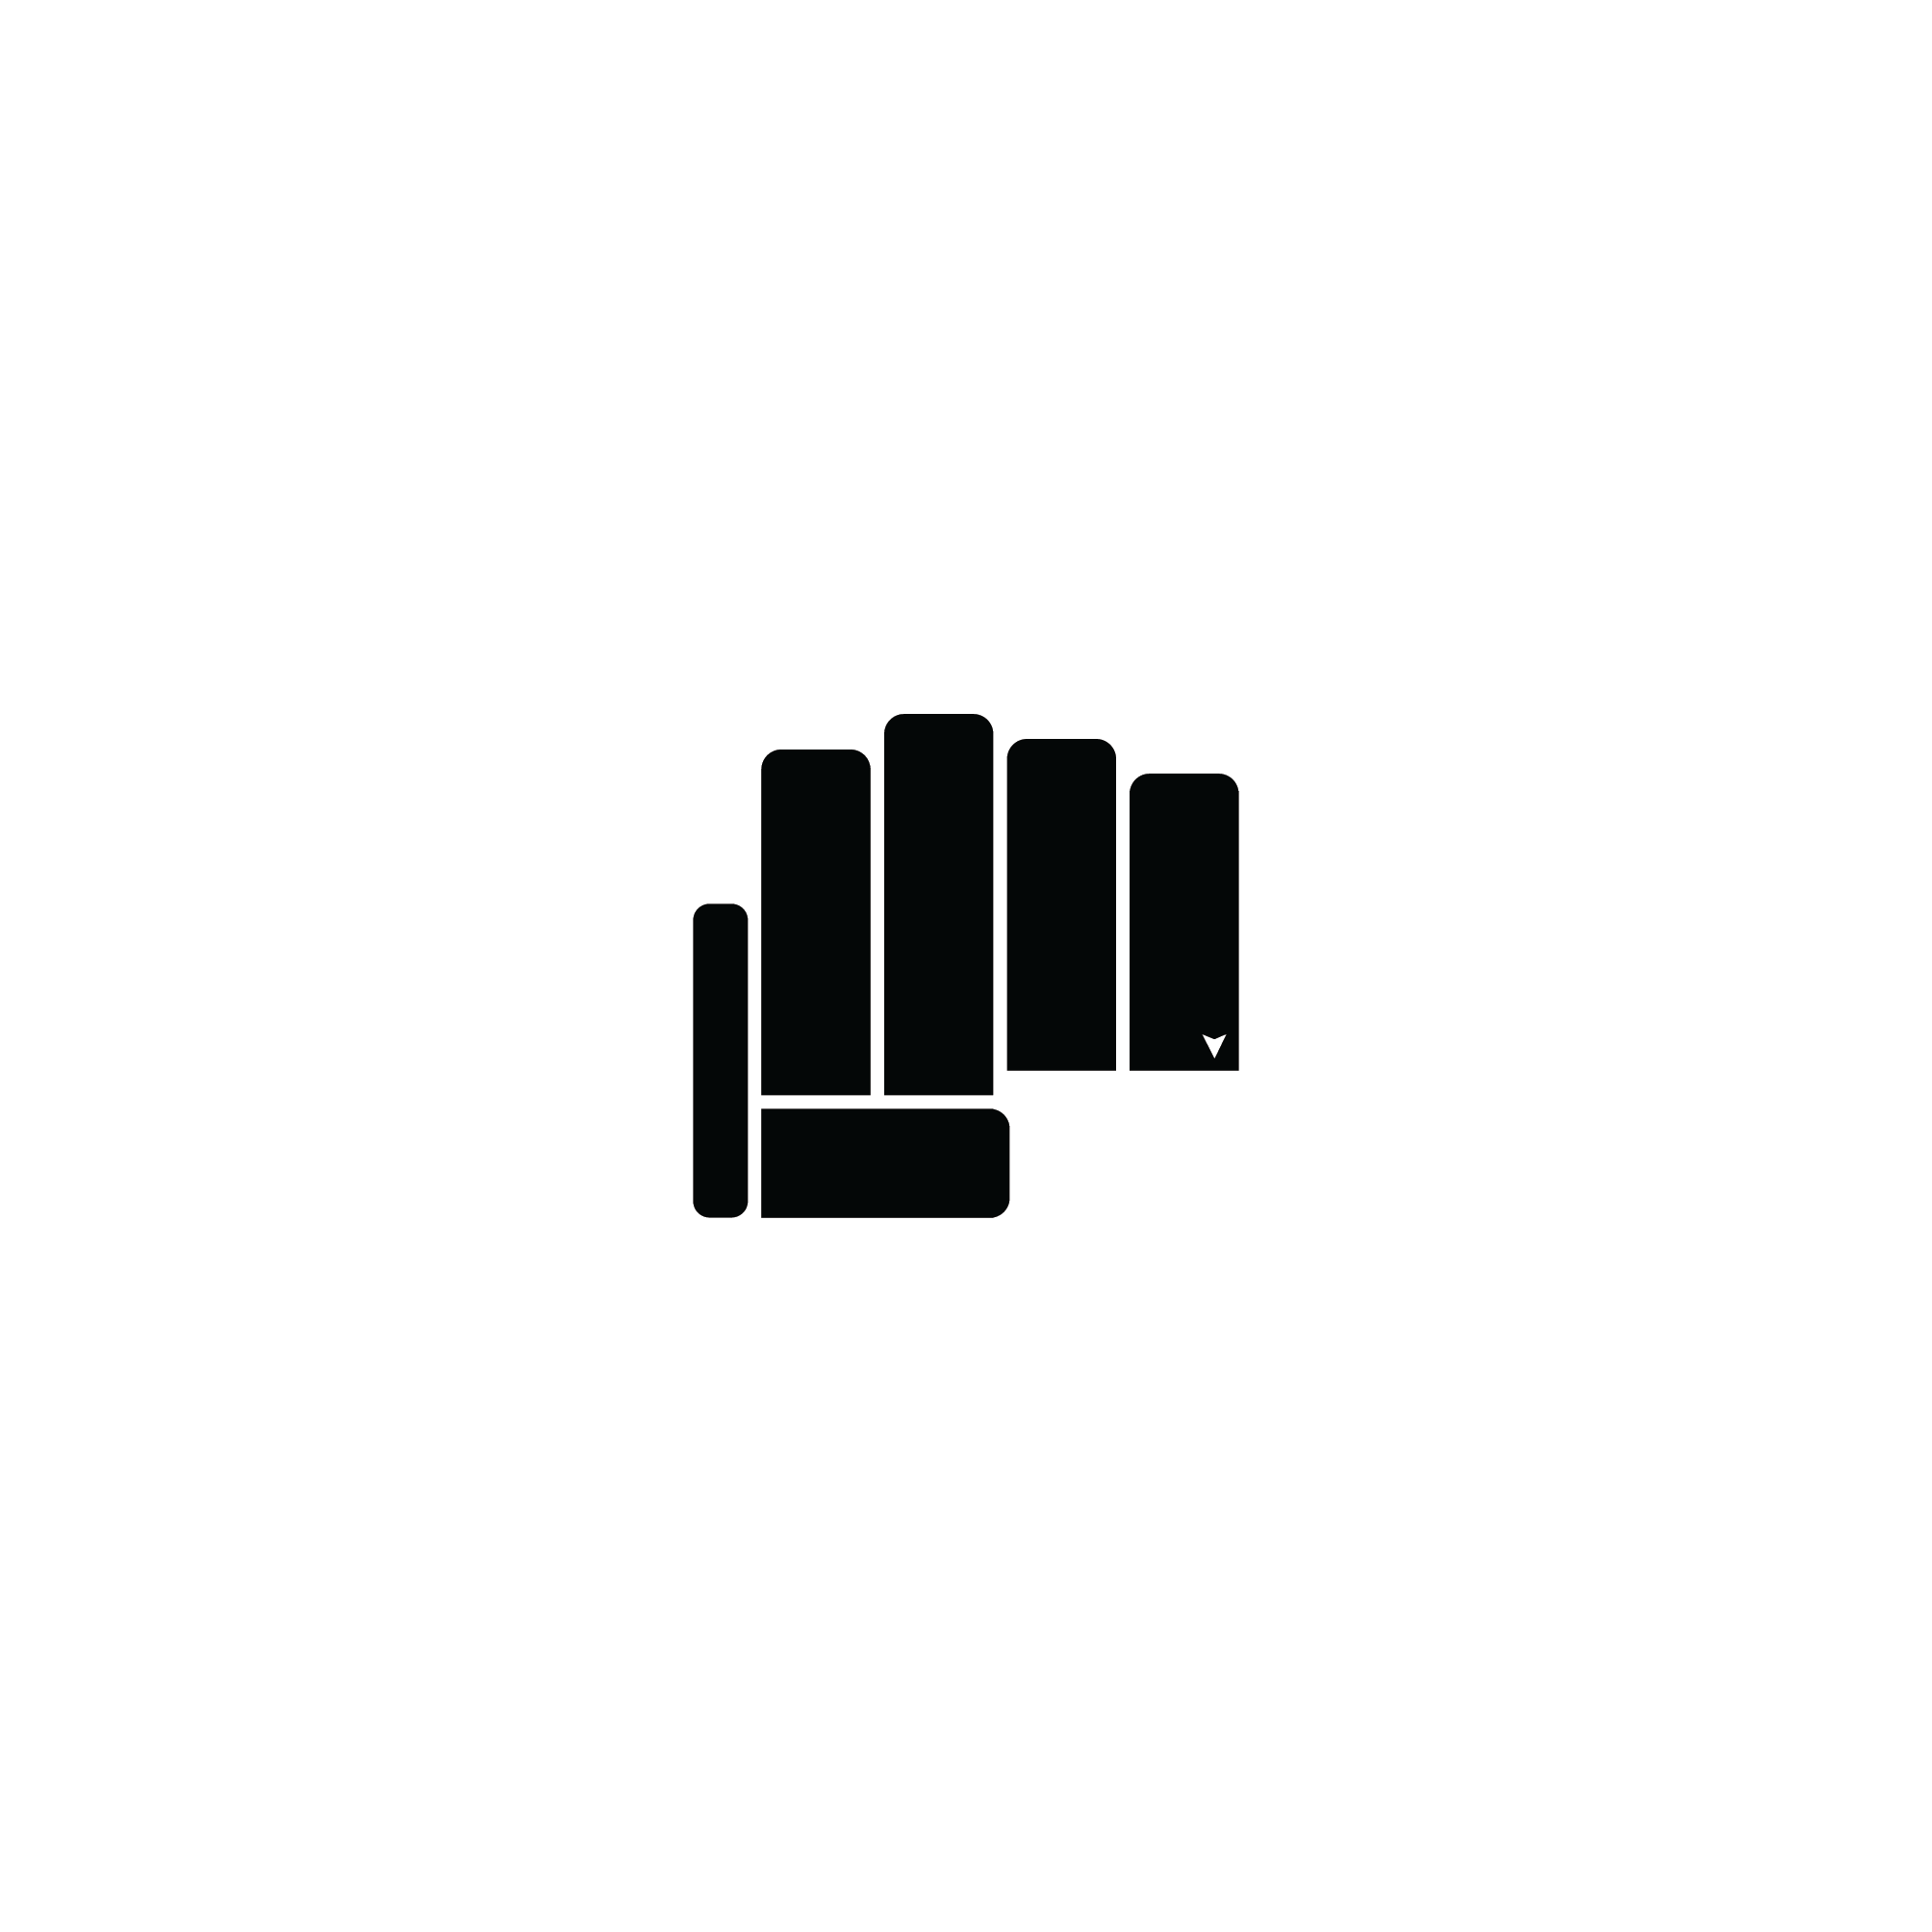 SOUTHPAW logo loader